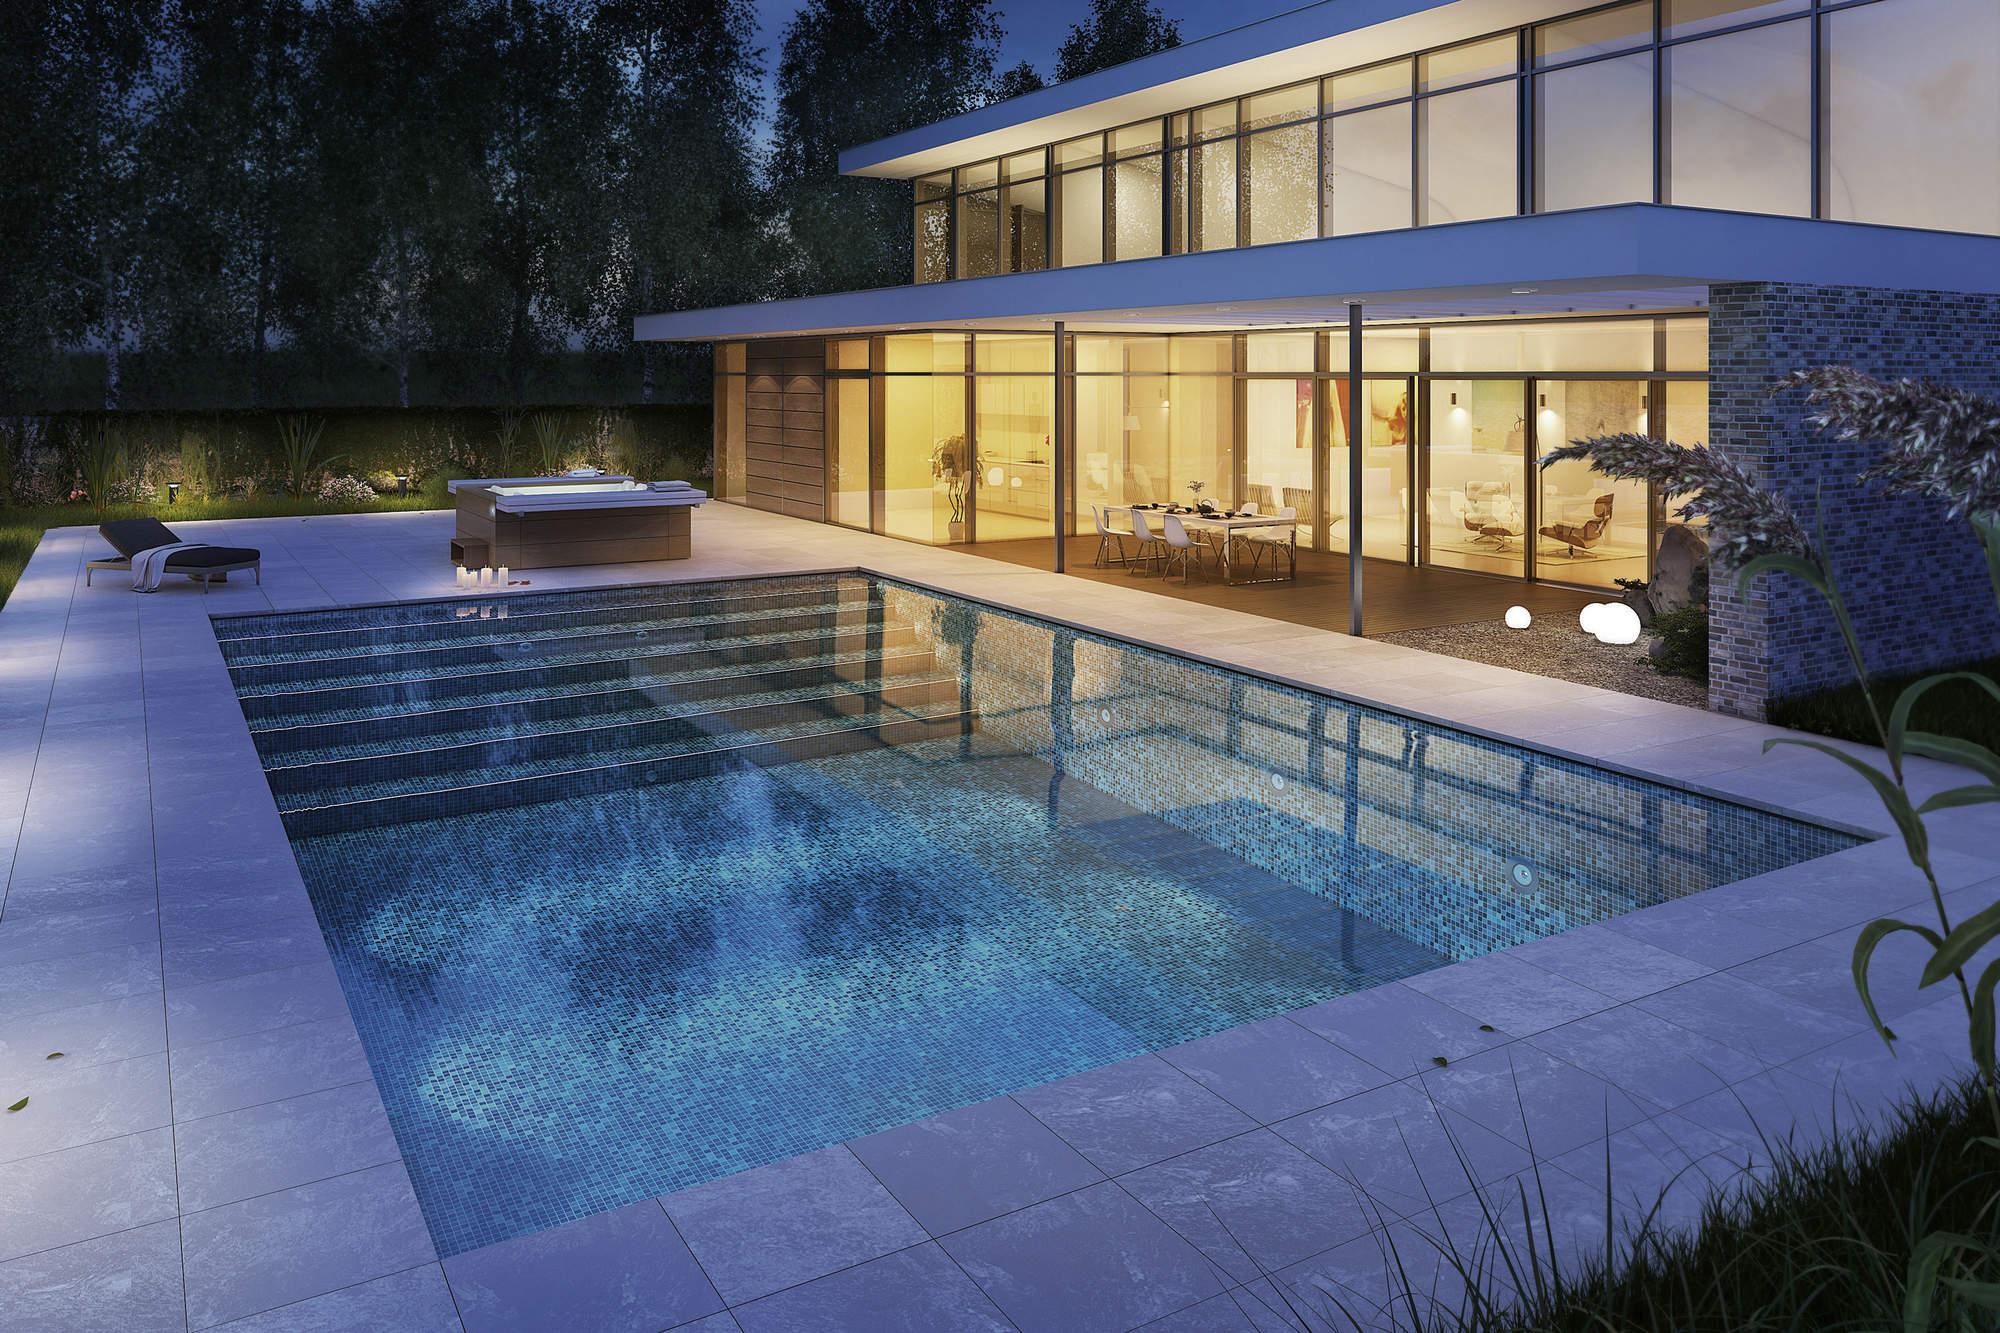 Soltech pools more swimming pool for Fertigbecken pool